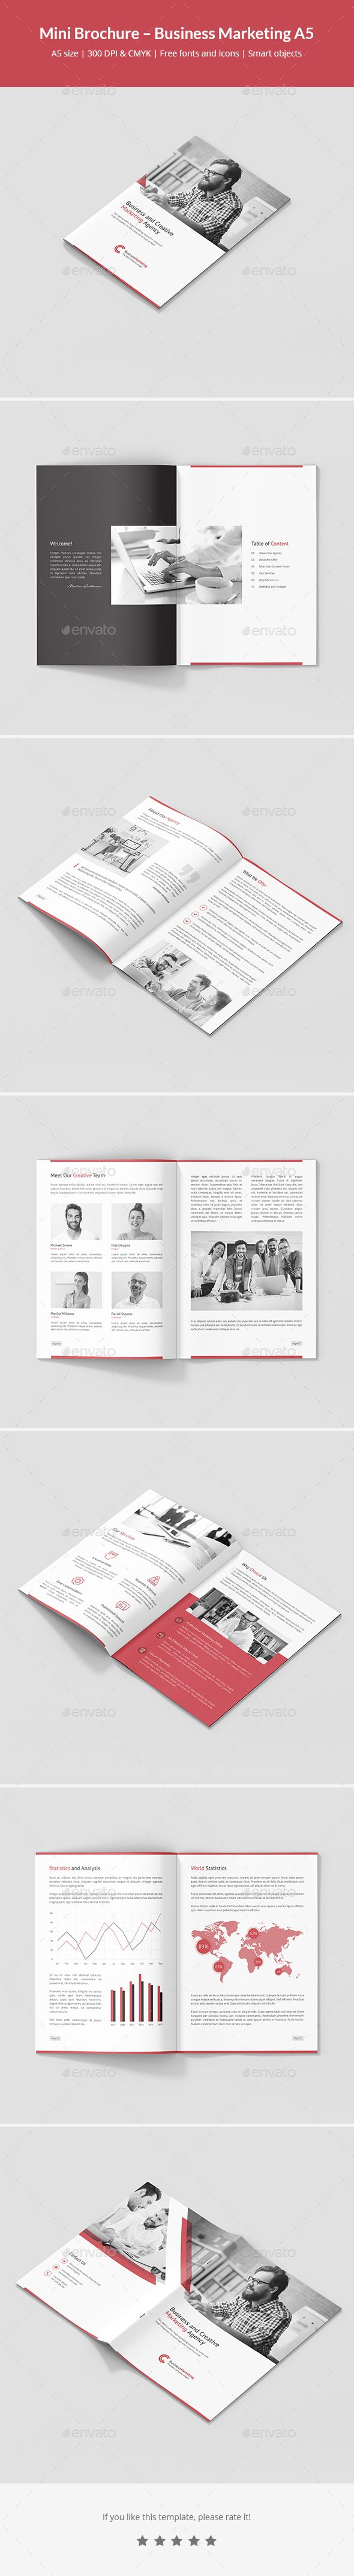 Mini Brochure Business Marketing A5 Business Marketing